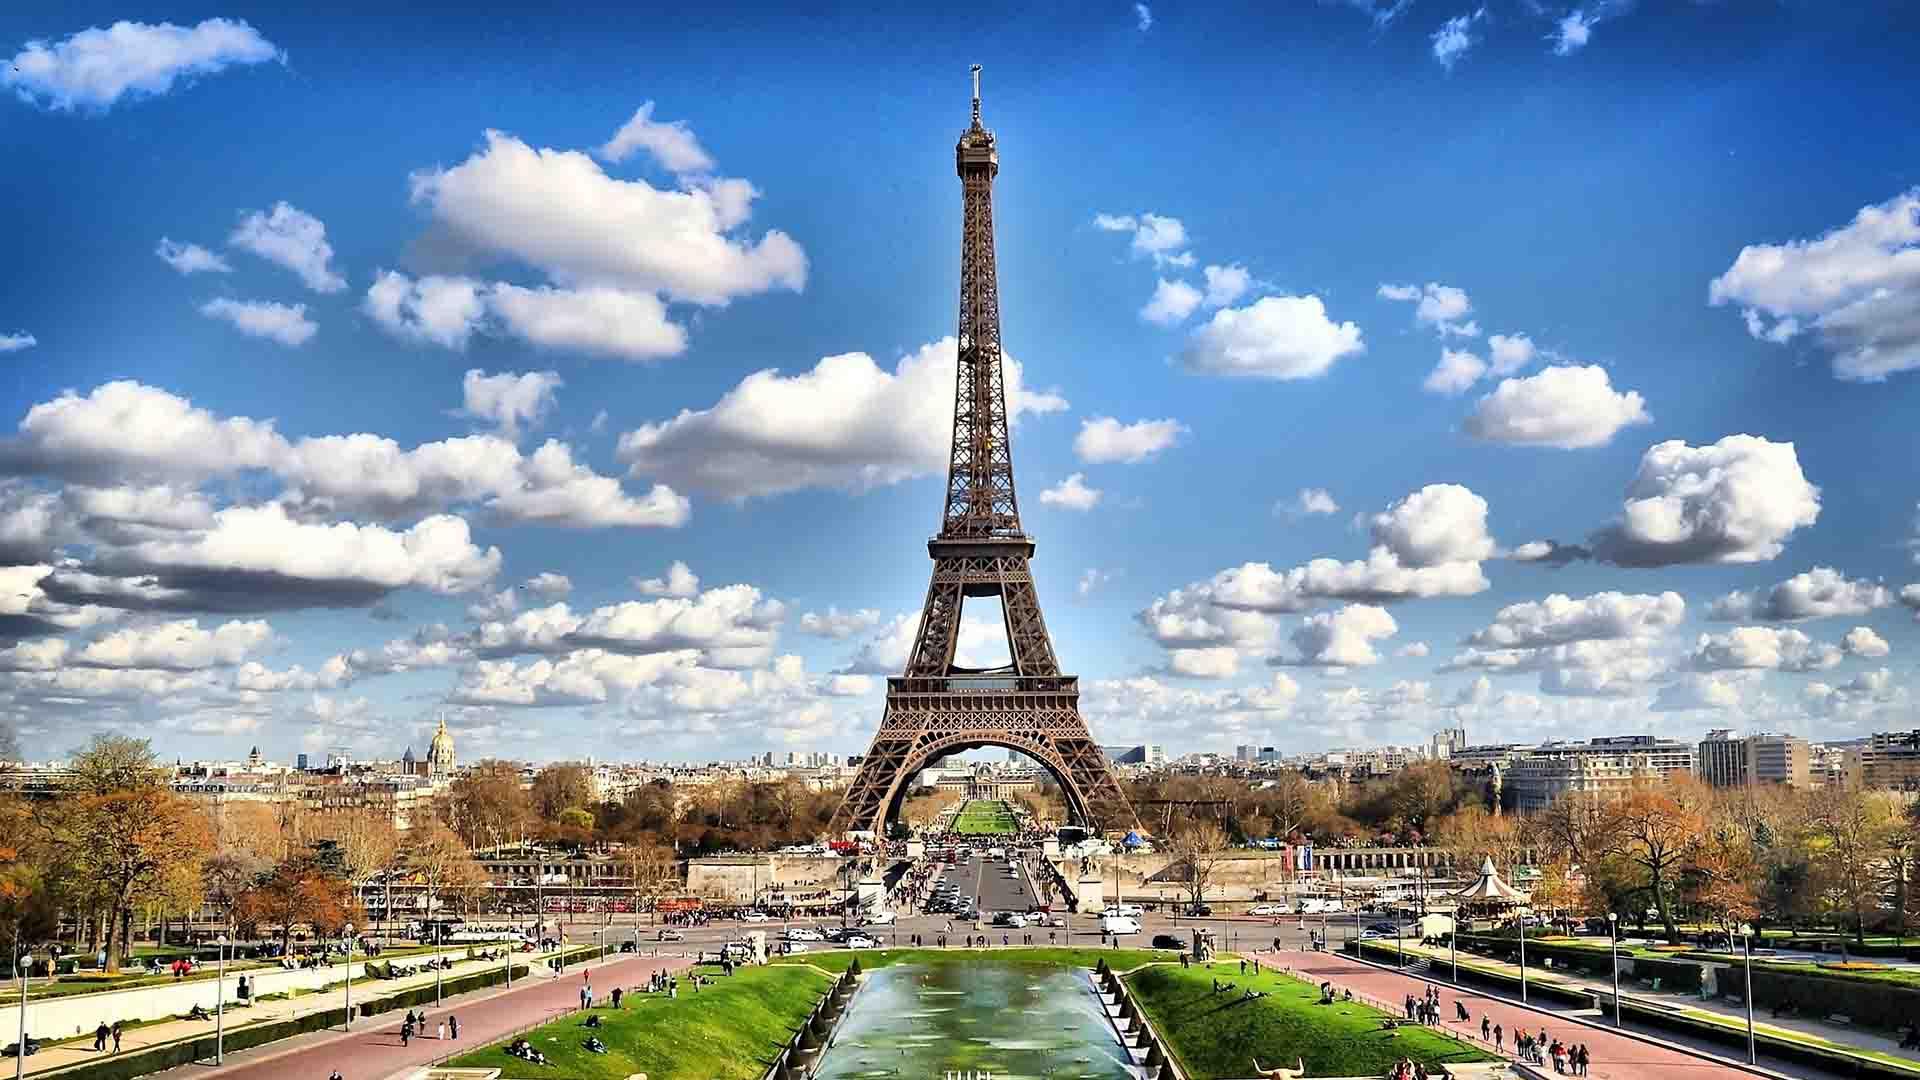 eiffel_tower_paris-in-france